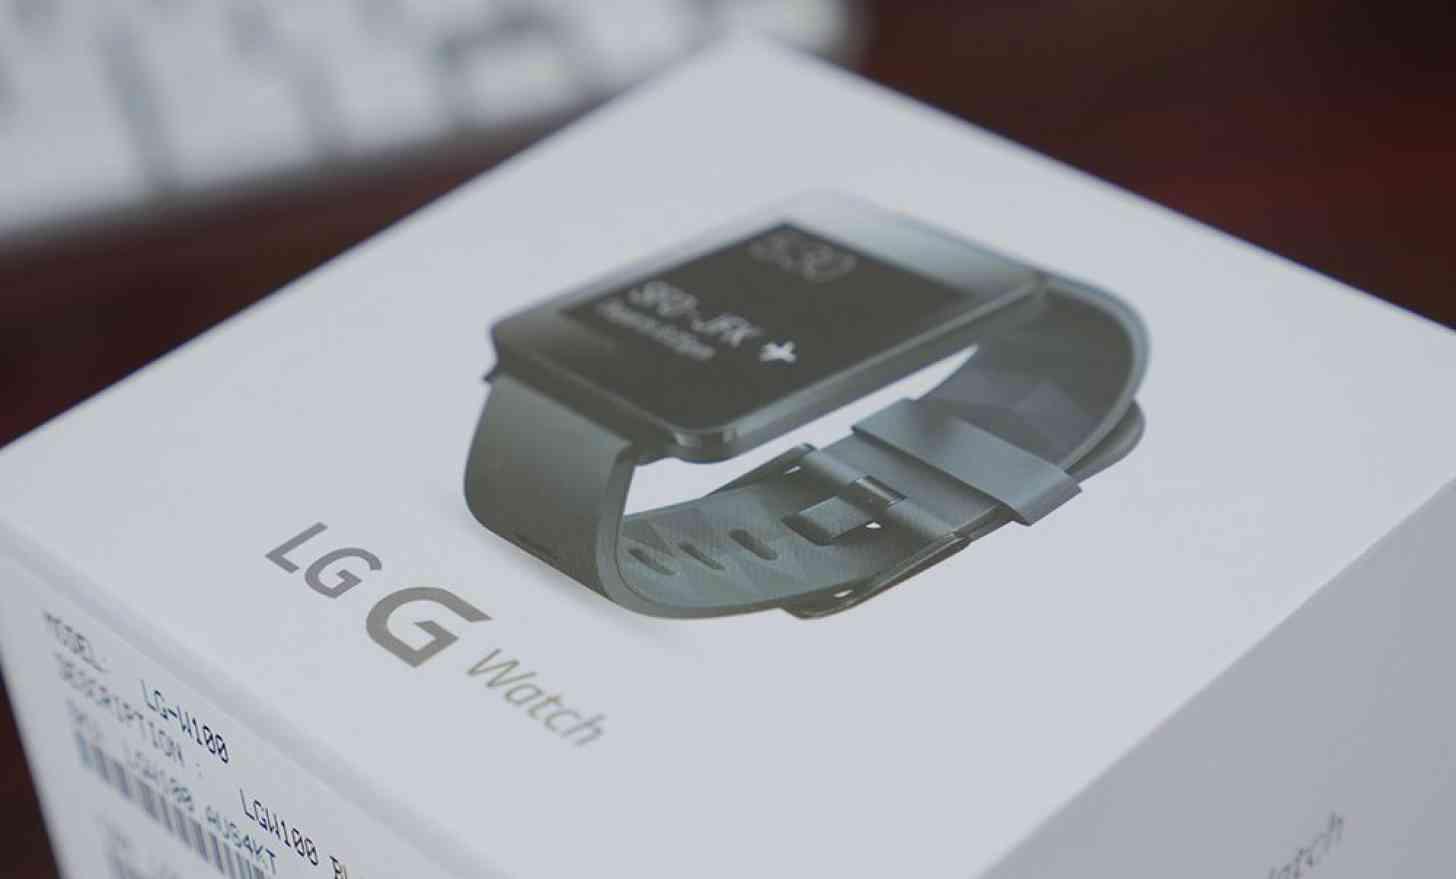 LG G Watch packaging